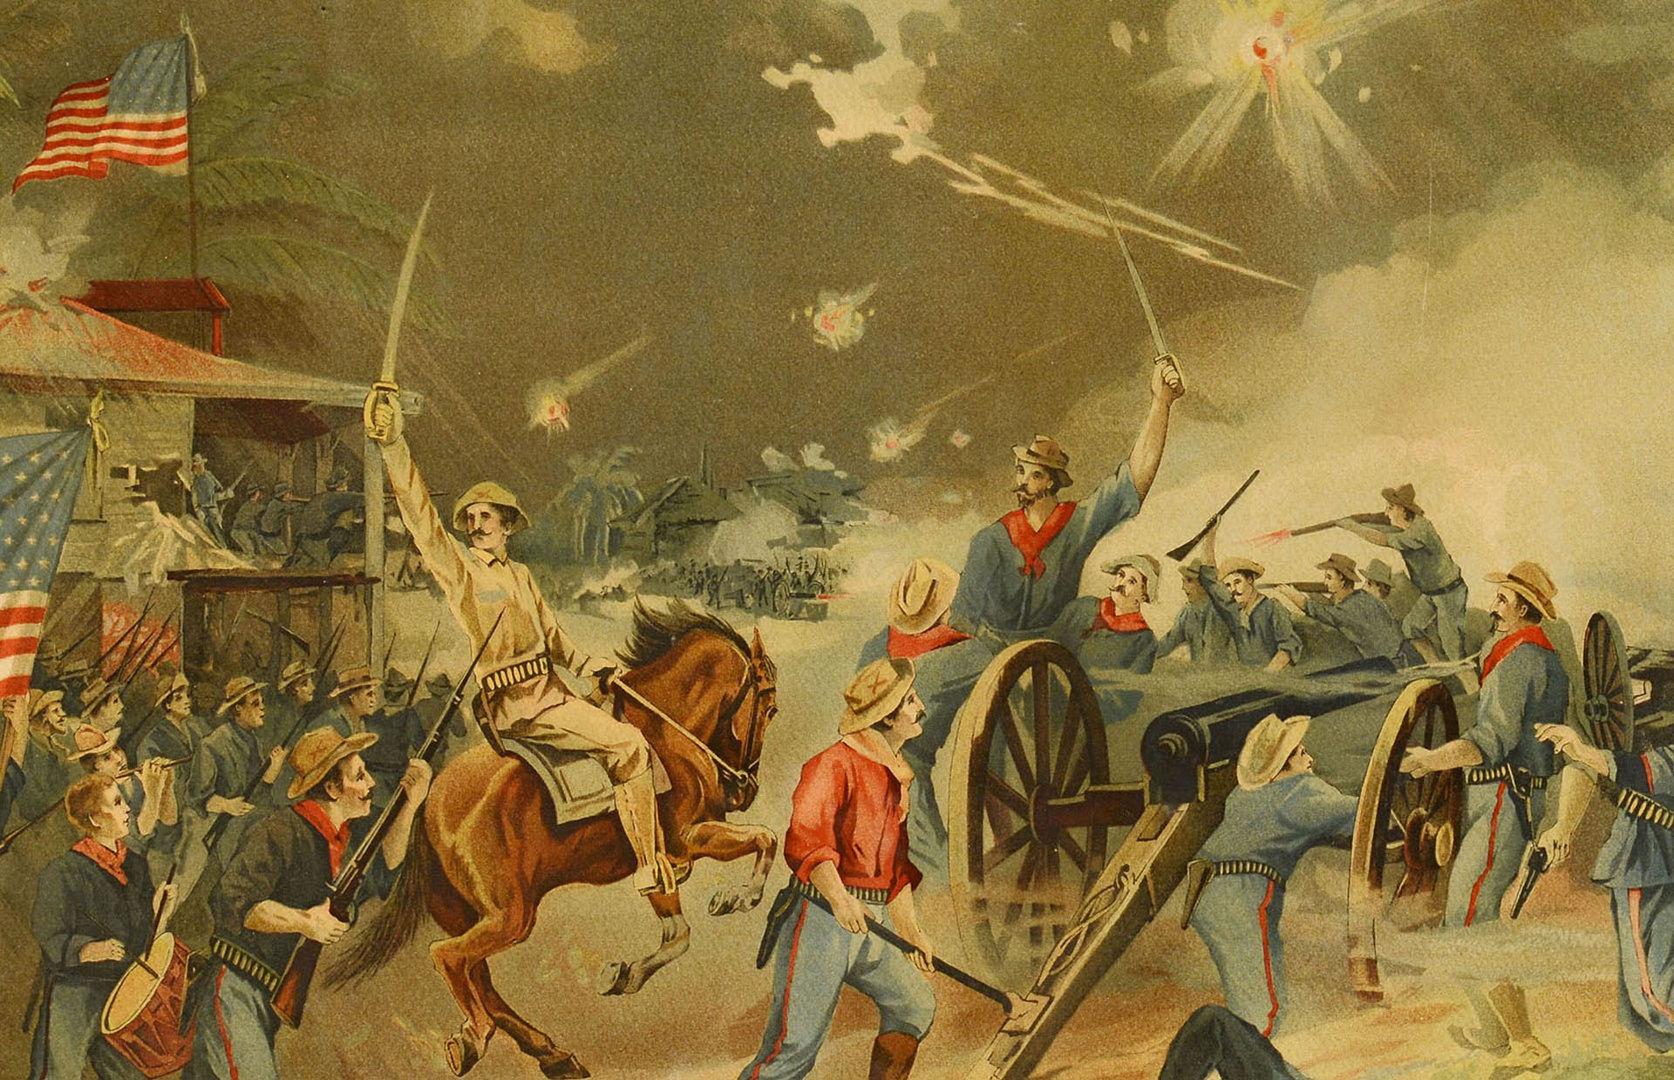 Lot 536 Spanish American War Lithograph